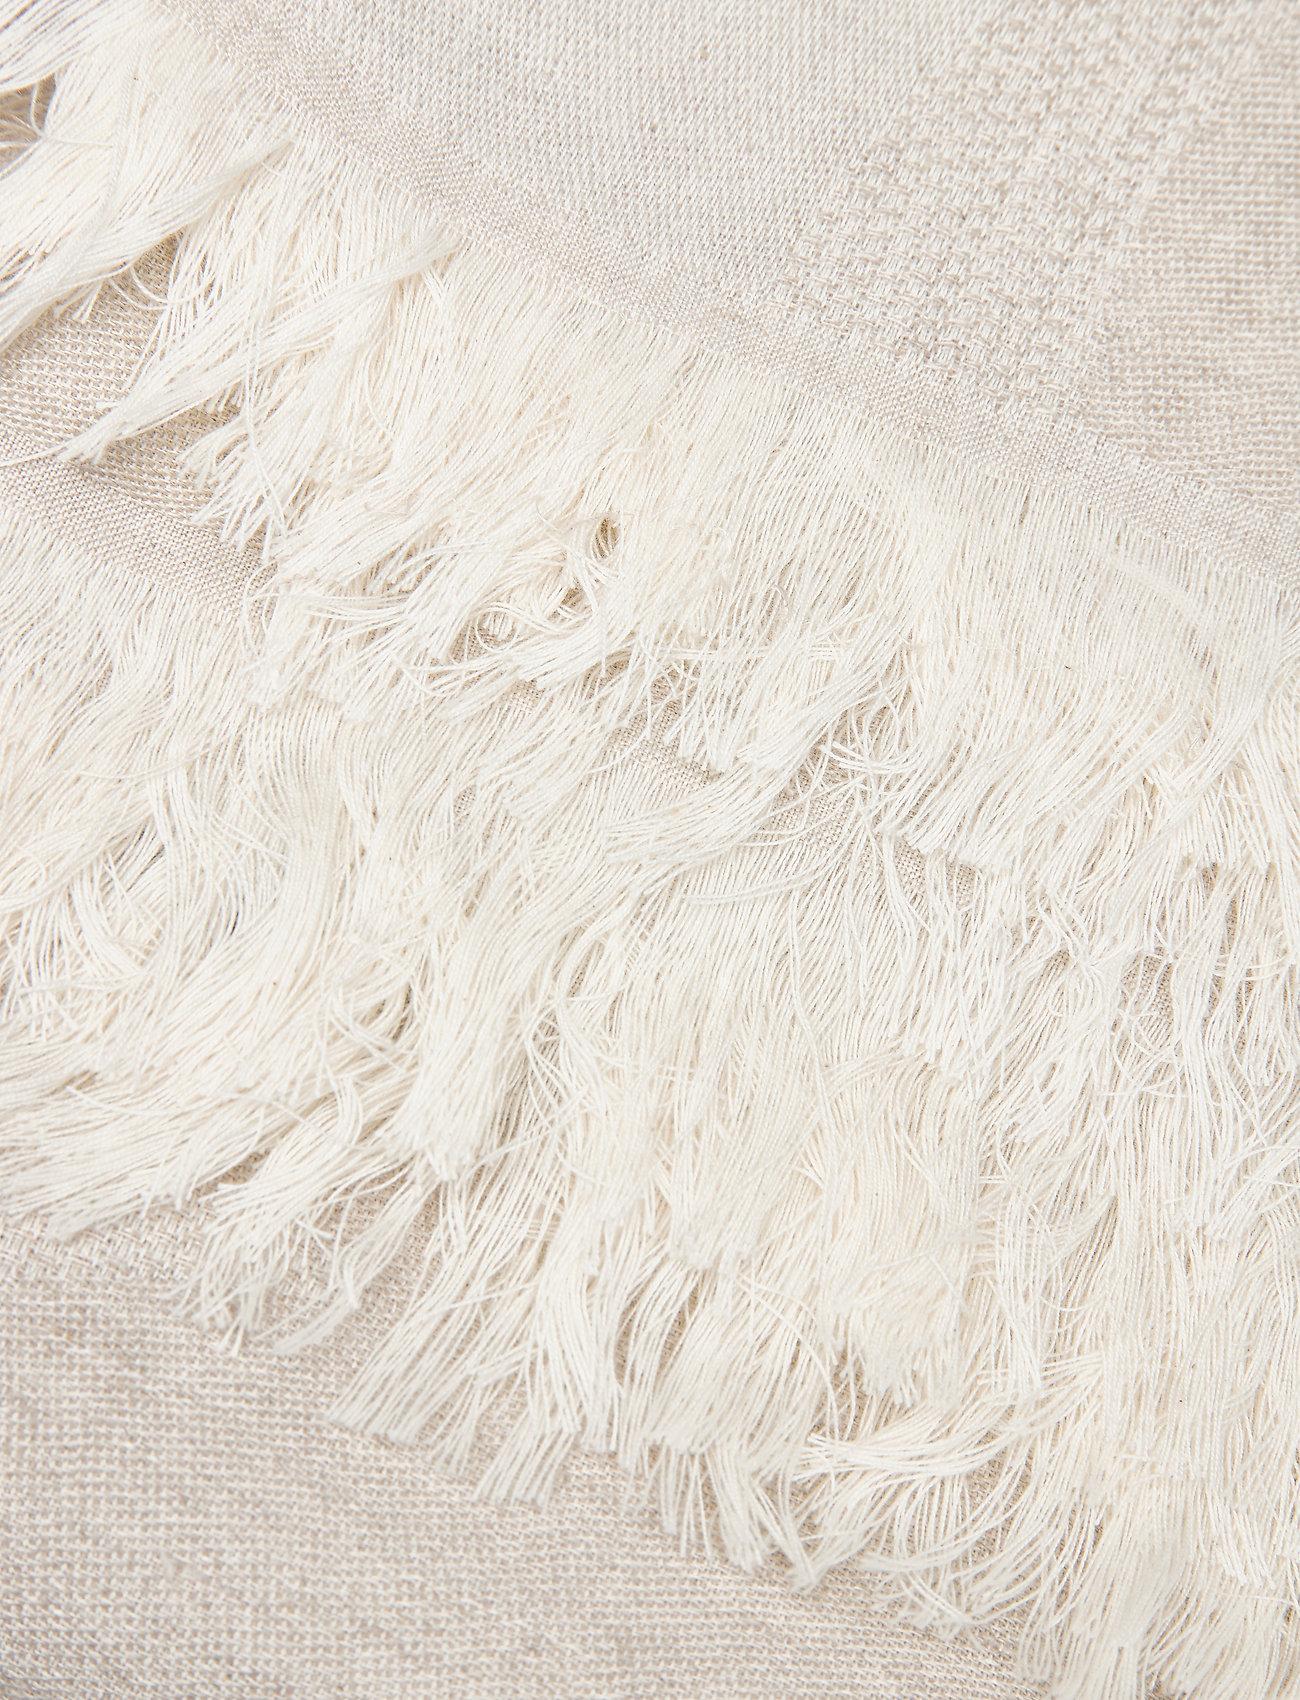 Unikko Co/li Blanket (Off-white Beige) (139 €) - Marimekko Home jN9xp